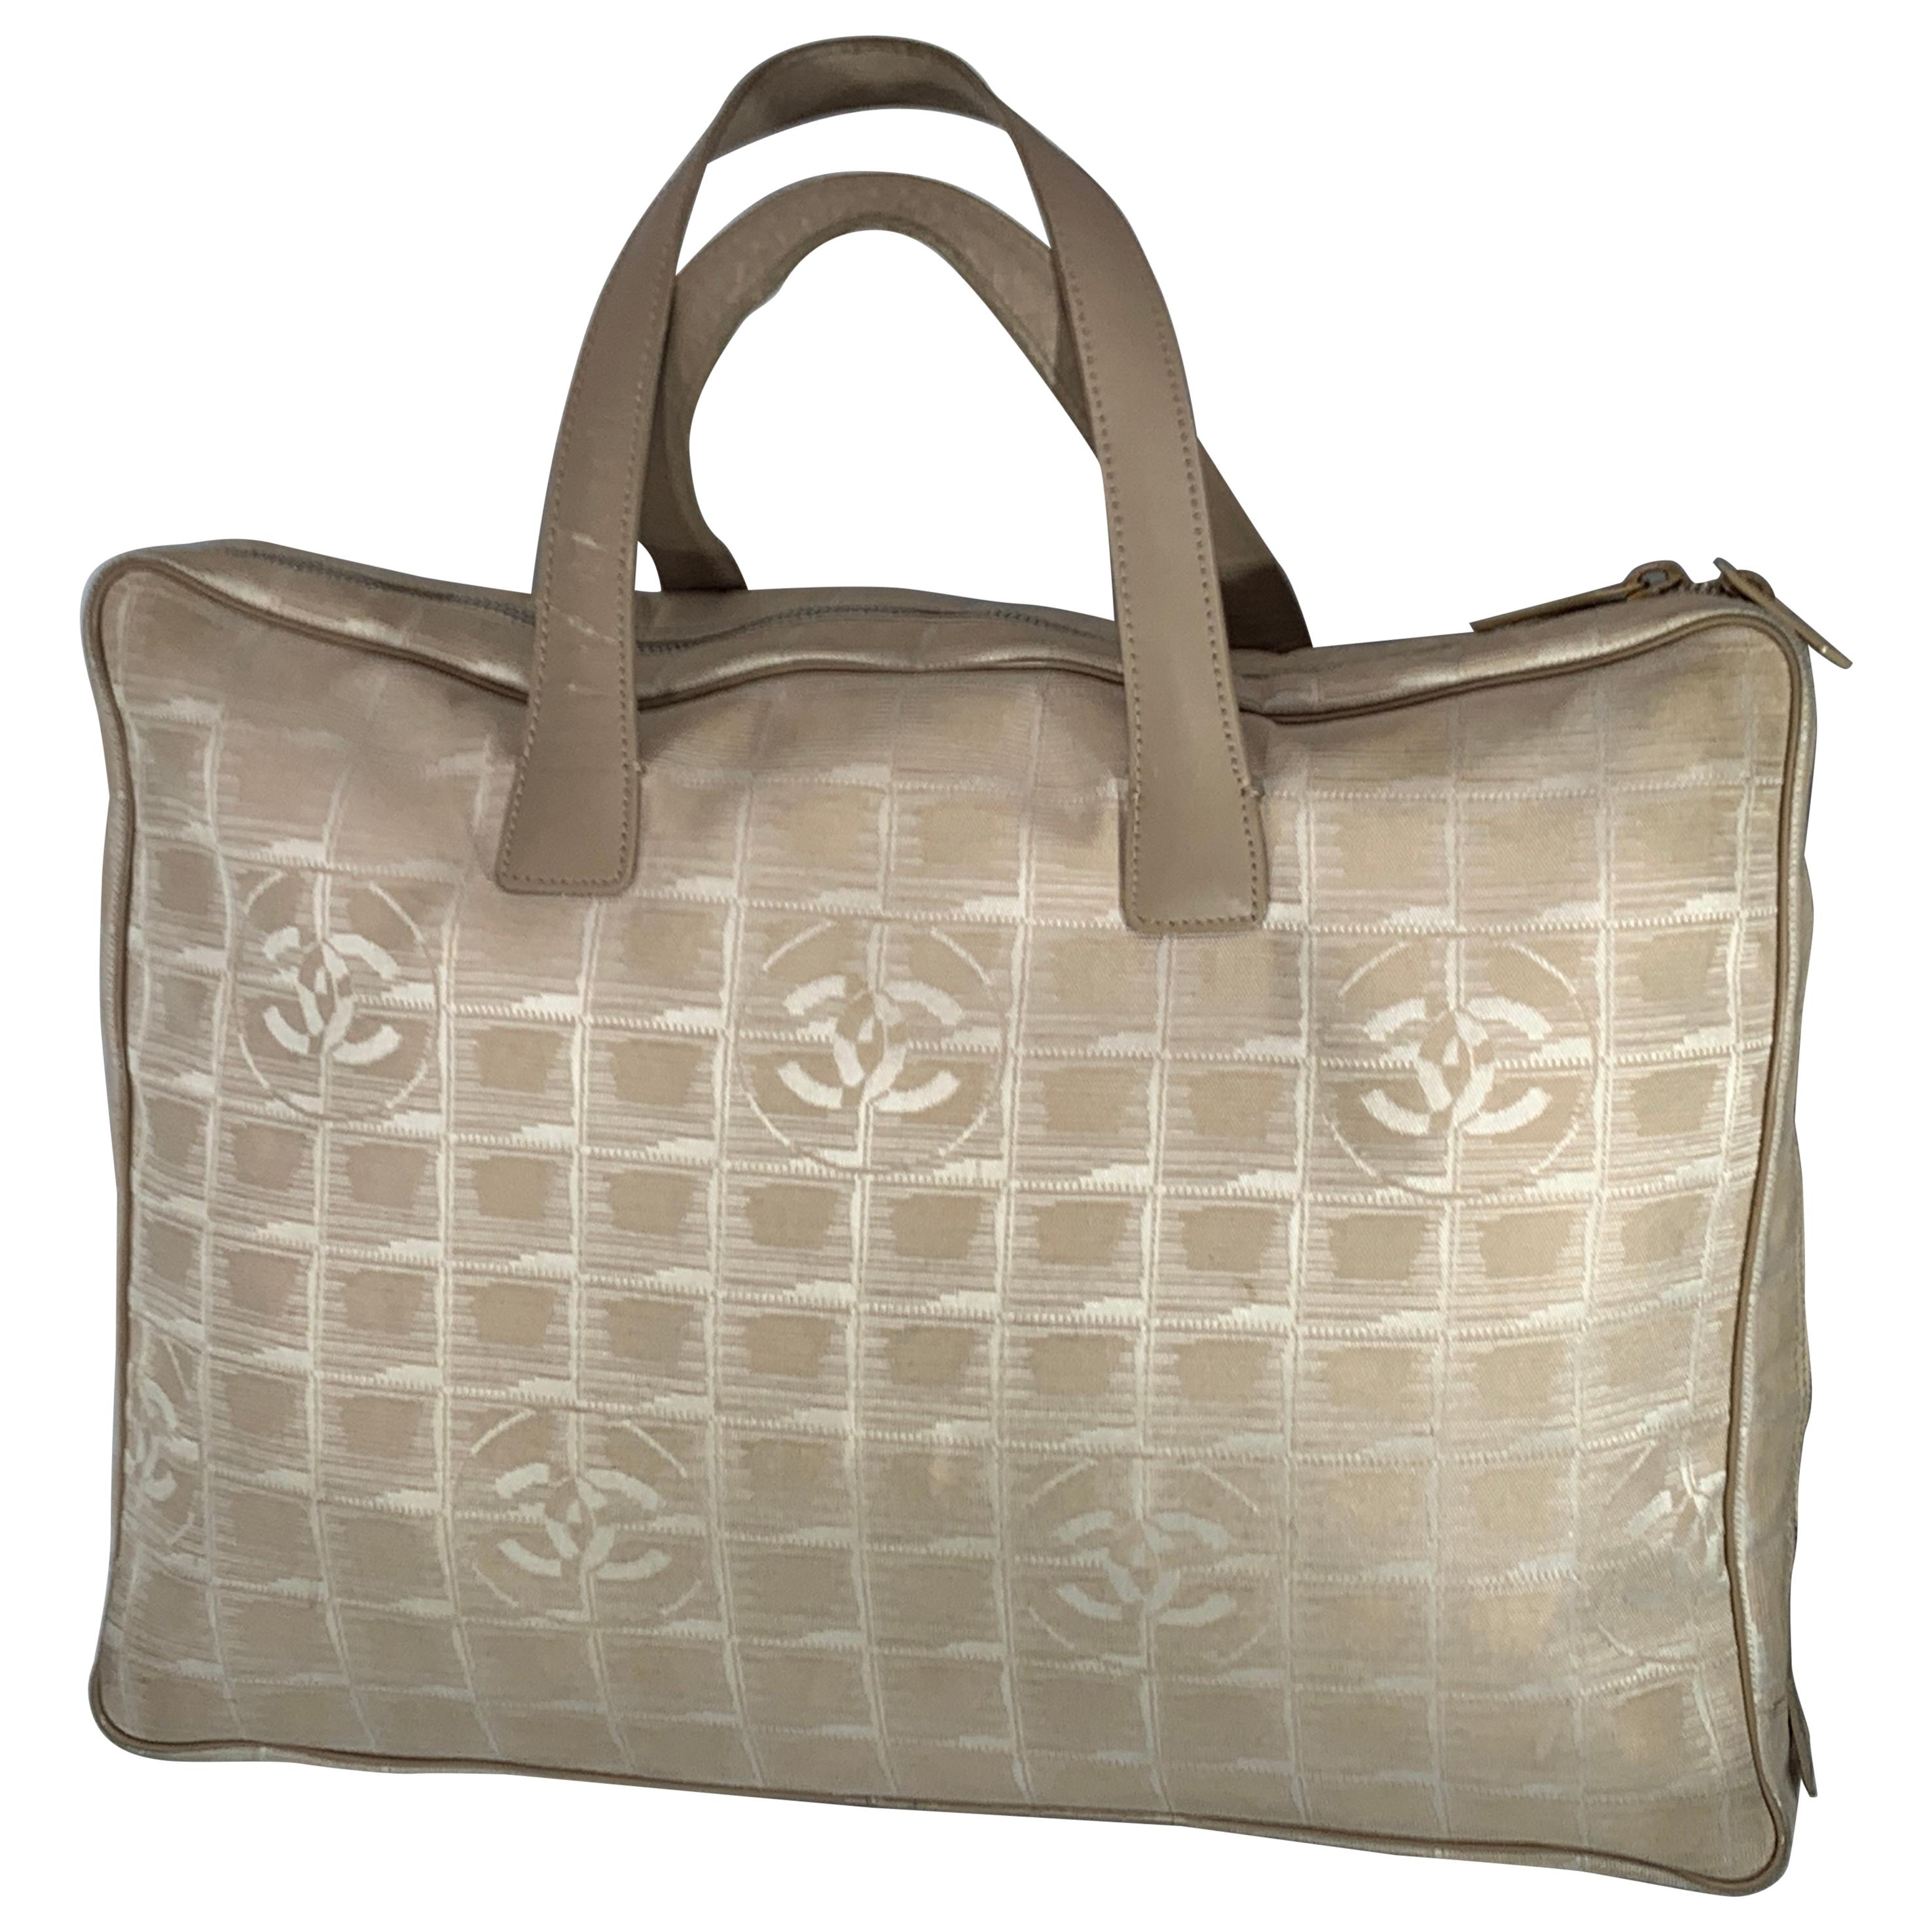 Chanel Handbag Bag New travel line Beige Nylon Jacquard Authentic Pre-Loved